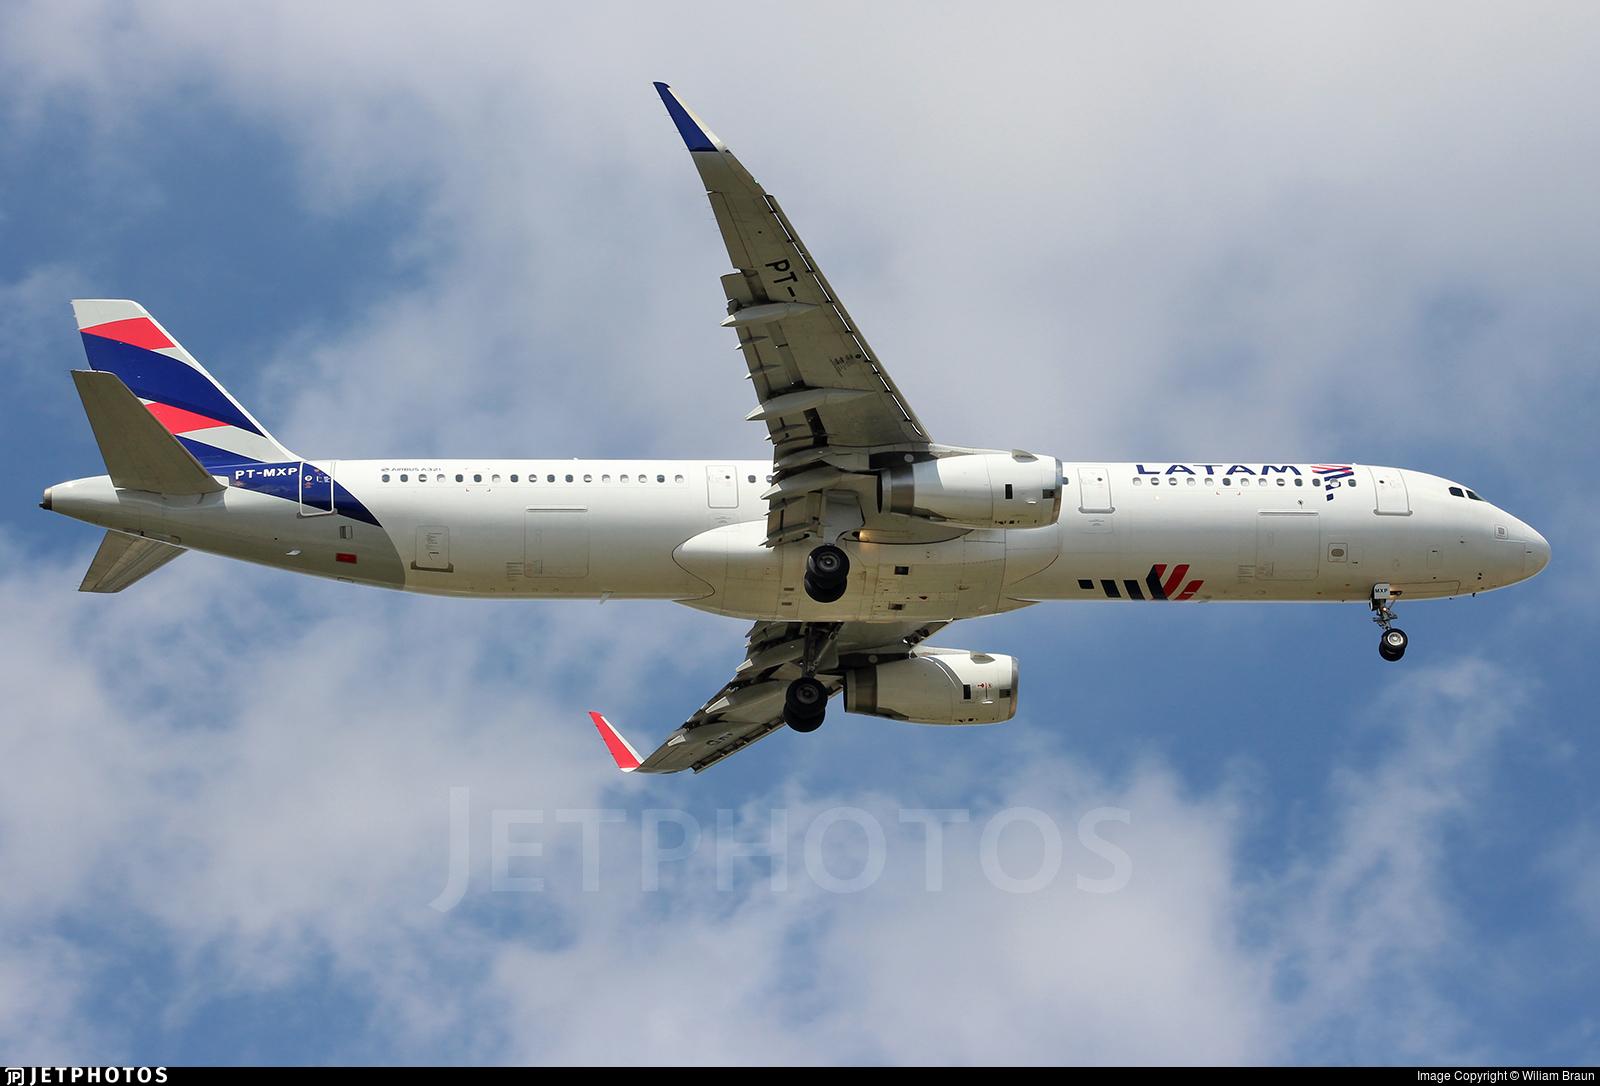 PT-MXP - Airbus A321-231 - LATAM Airlines